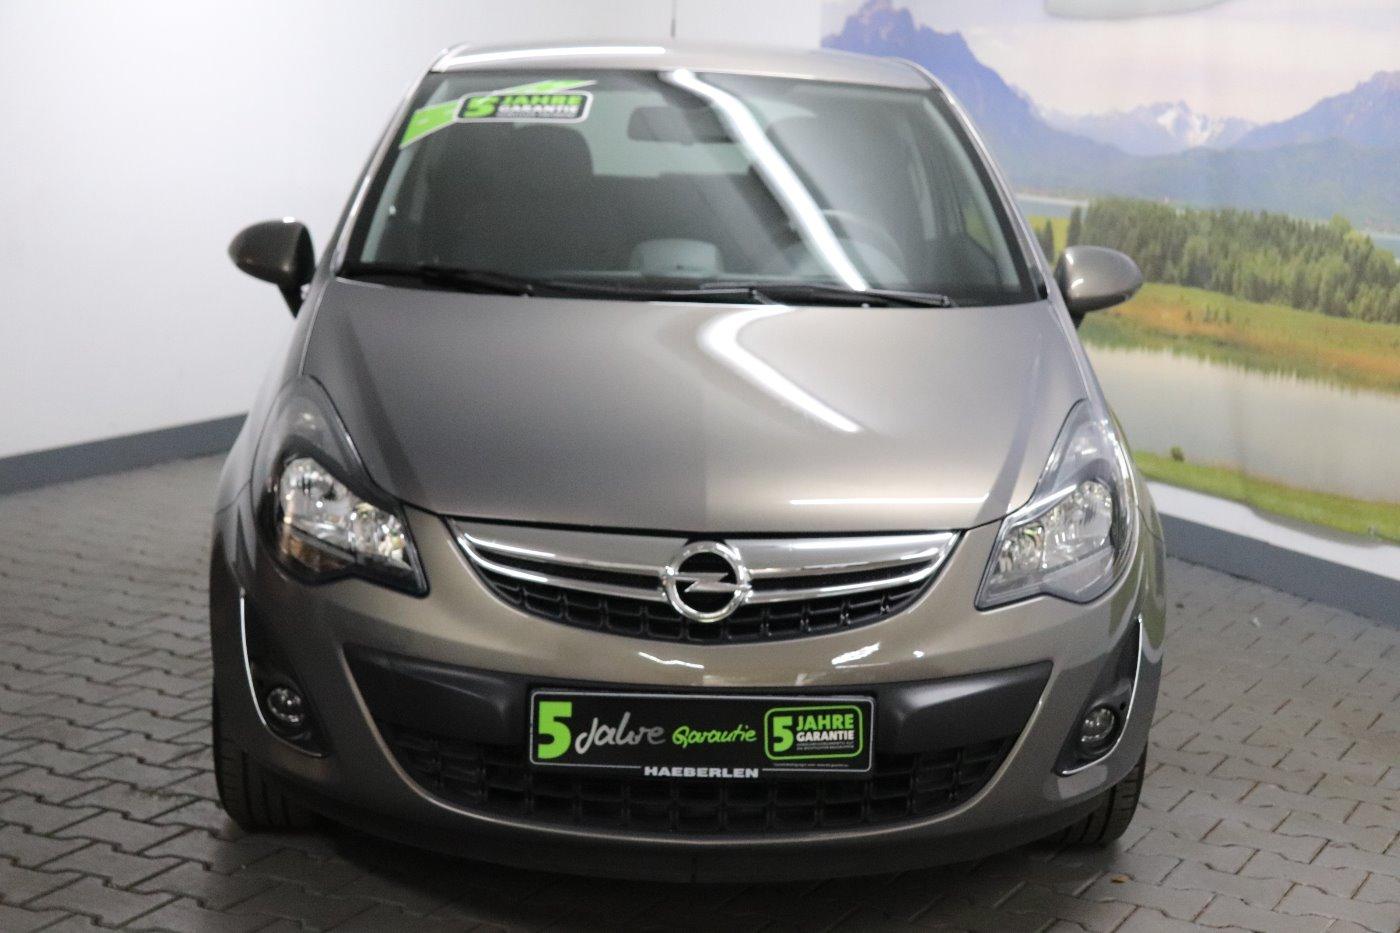 Opel Corsa D 1.4 Energy Teilleder Bremsass Sitzh., Jahr 2013, Benzin